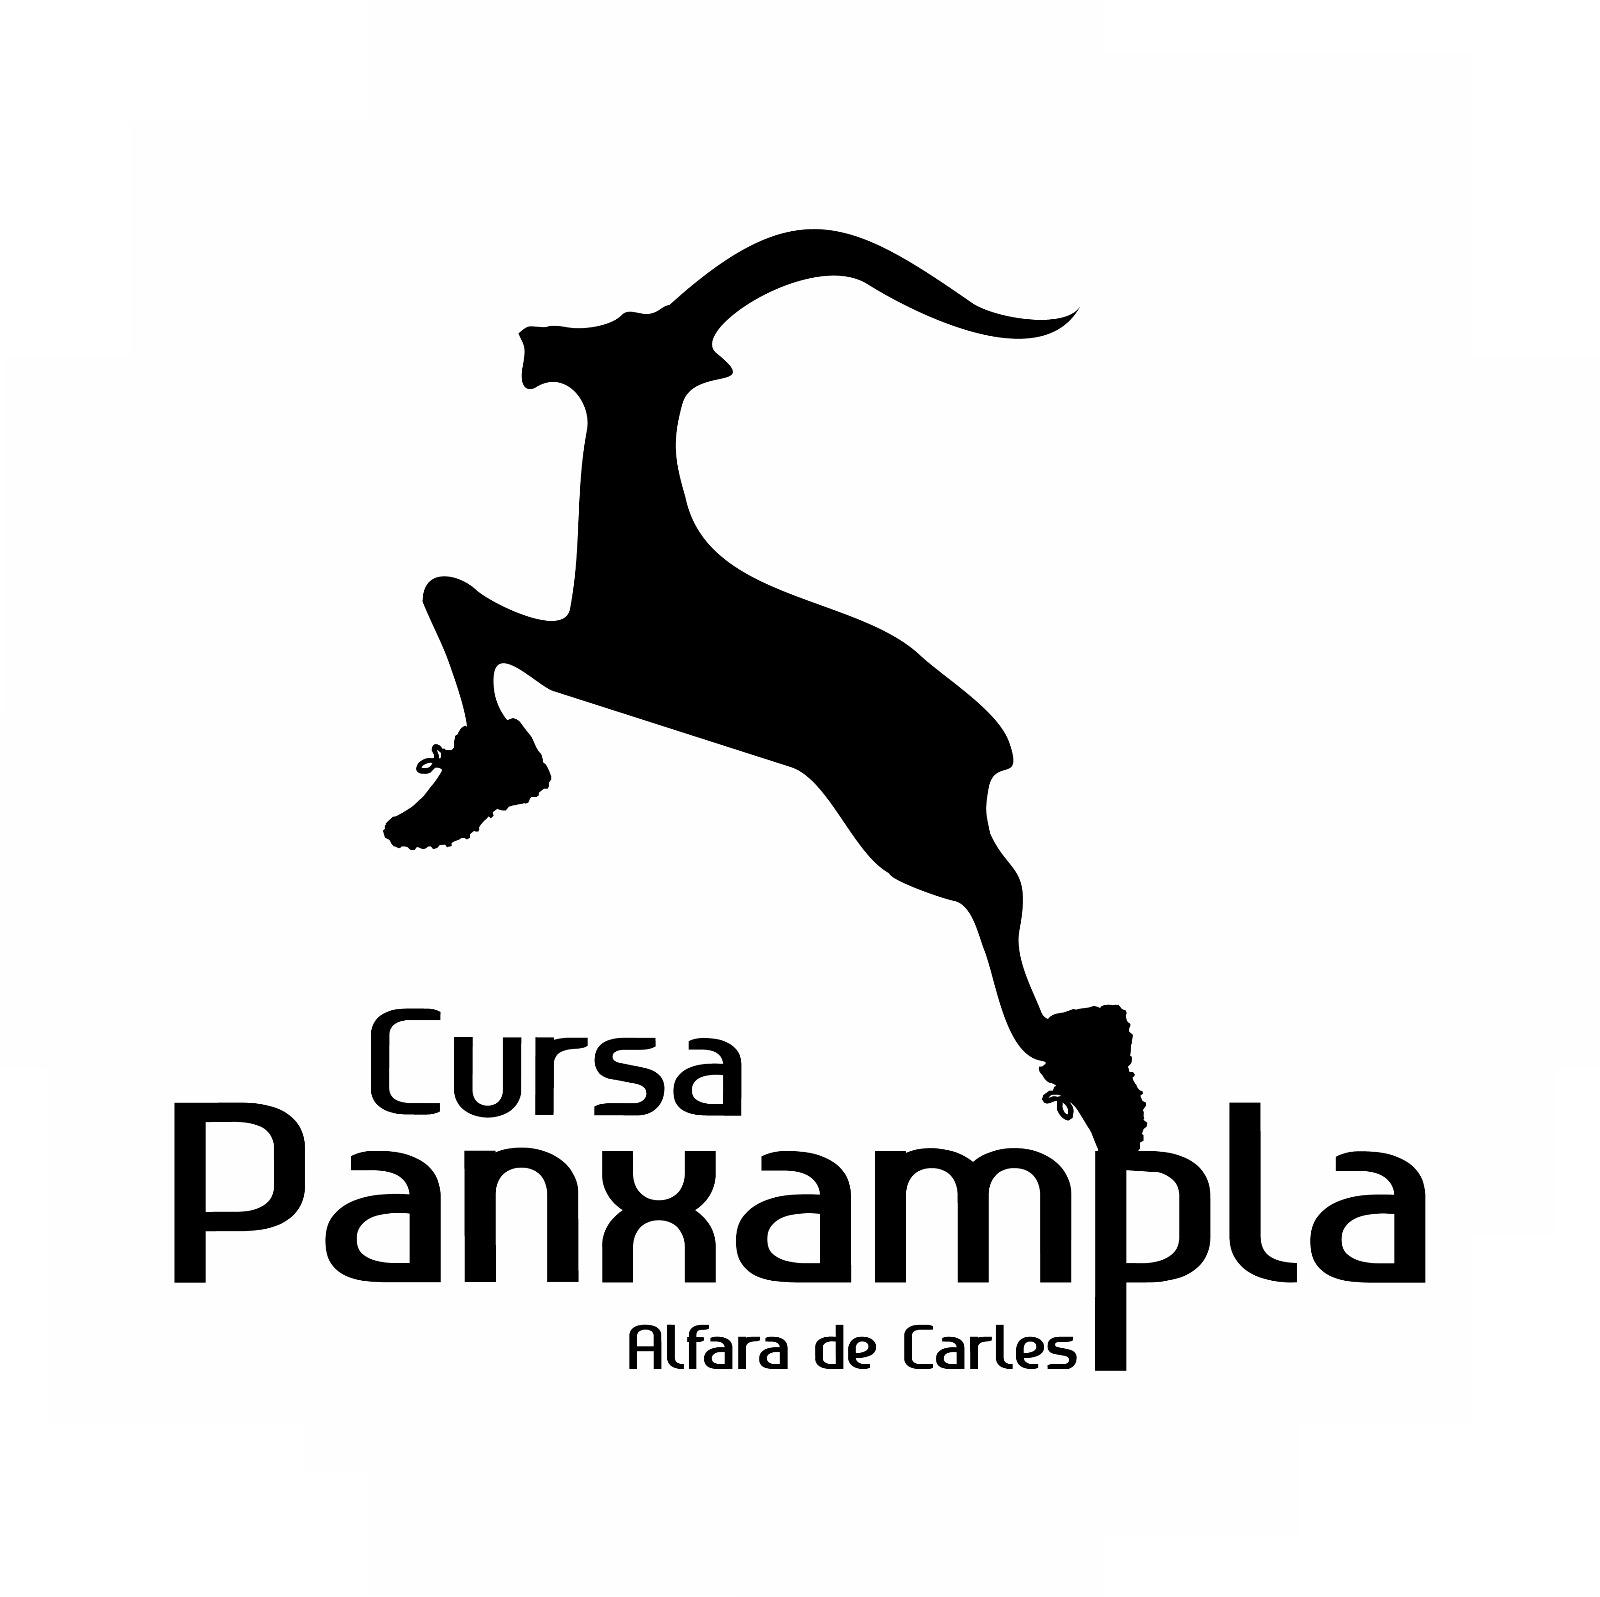 CursaPanxampla